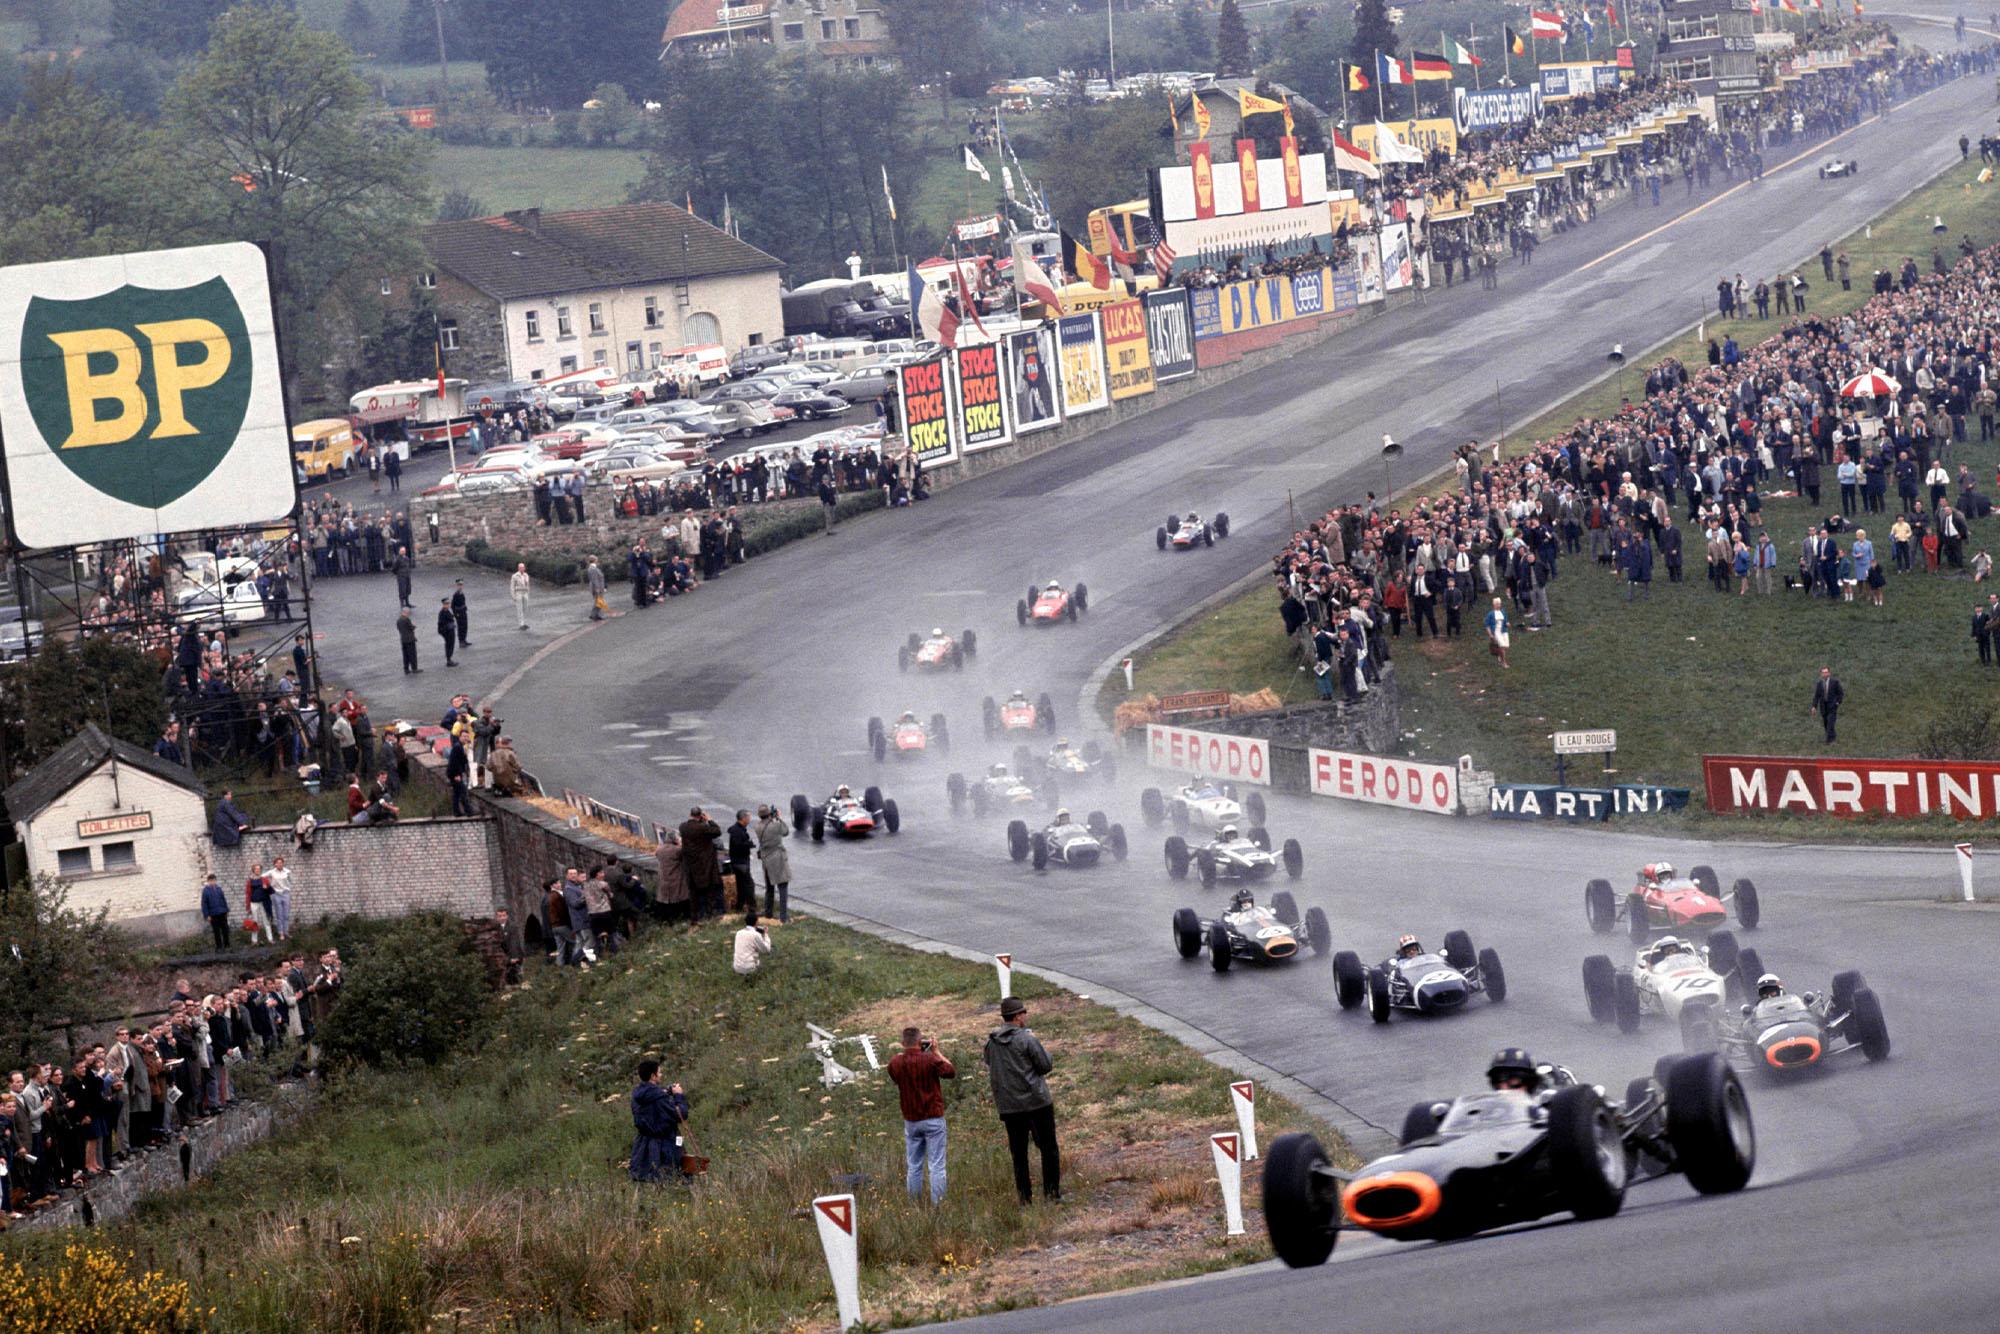 Graham Hill leads Jackie Stewart (Both BRM P261's), Richie Ginther (Honda RA272), Jo Siffert (Brabham BT11 BRM), John Surtees (Ferrari 158), Dan Gurney (Brabham BT11 Climax) and the rest of the field through Eau Rouge at the start.